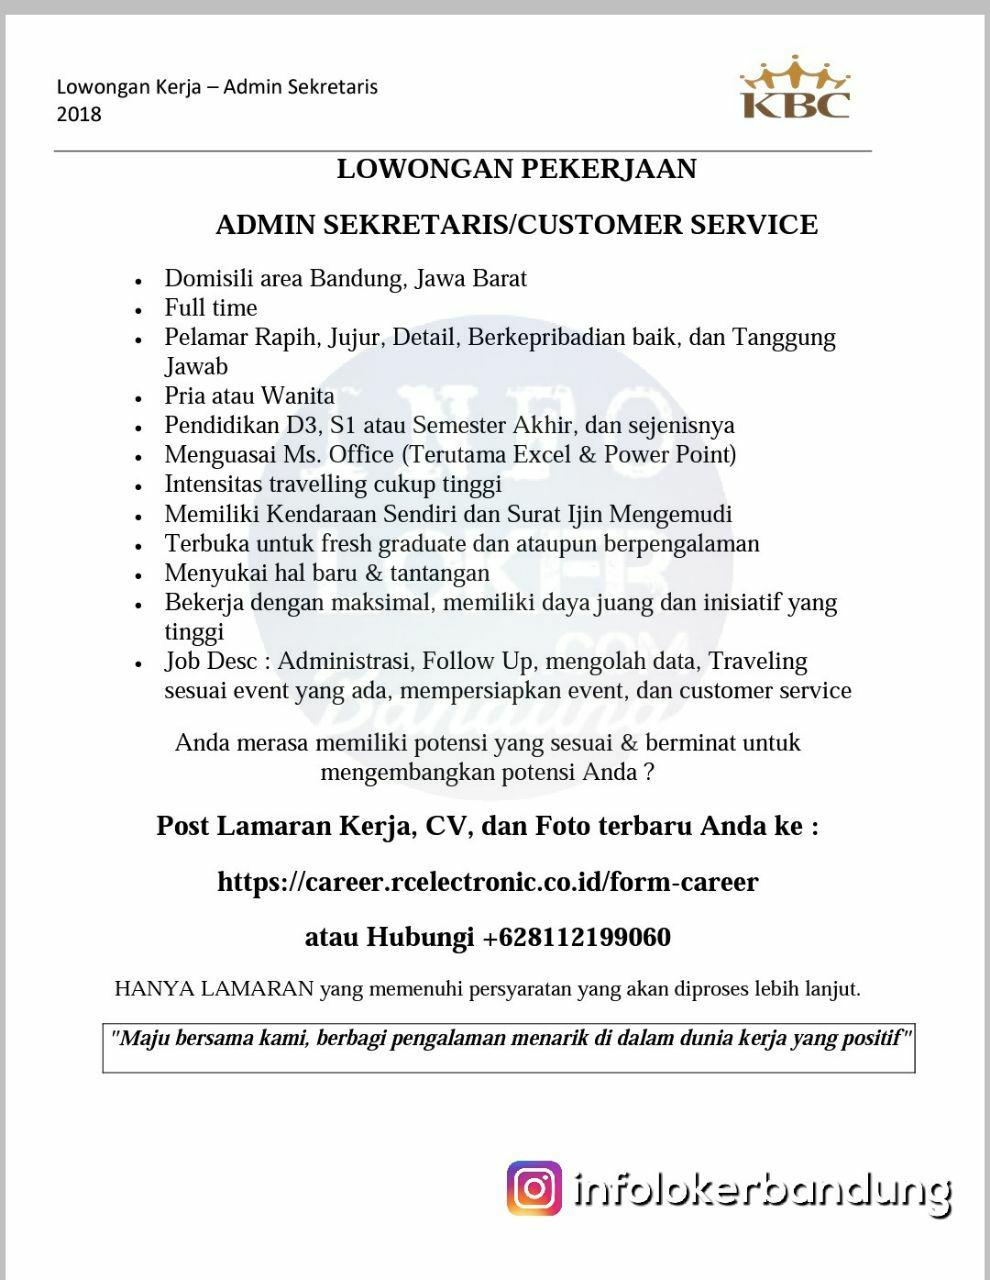 Lowongan Kerja Admin Sekretaris CV. RC Electronic Bandung Maret 2018